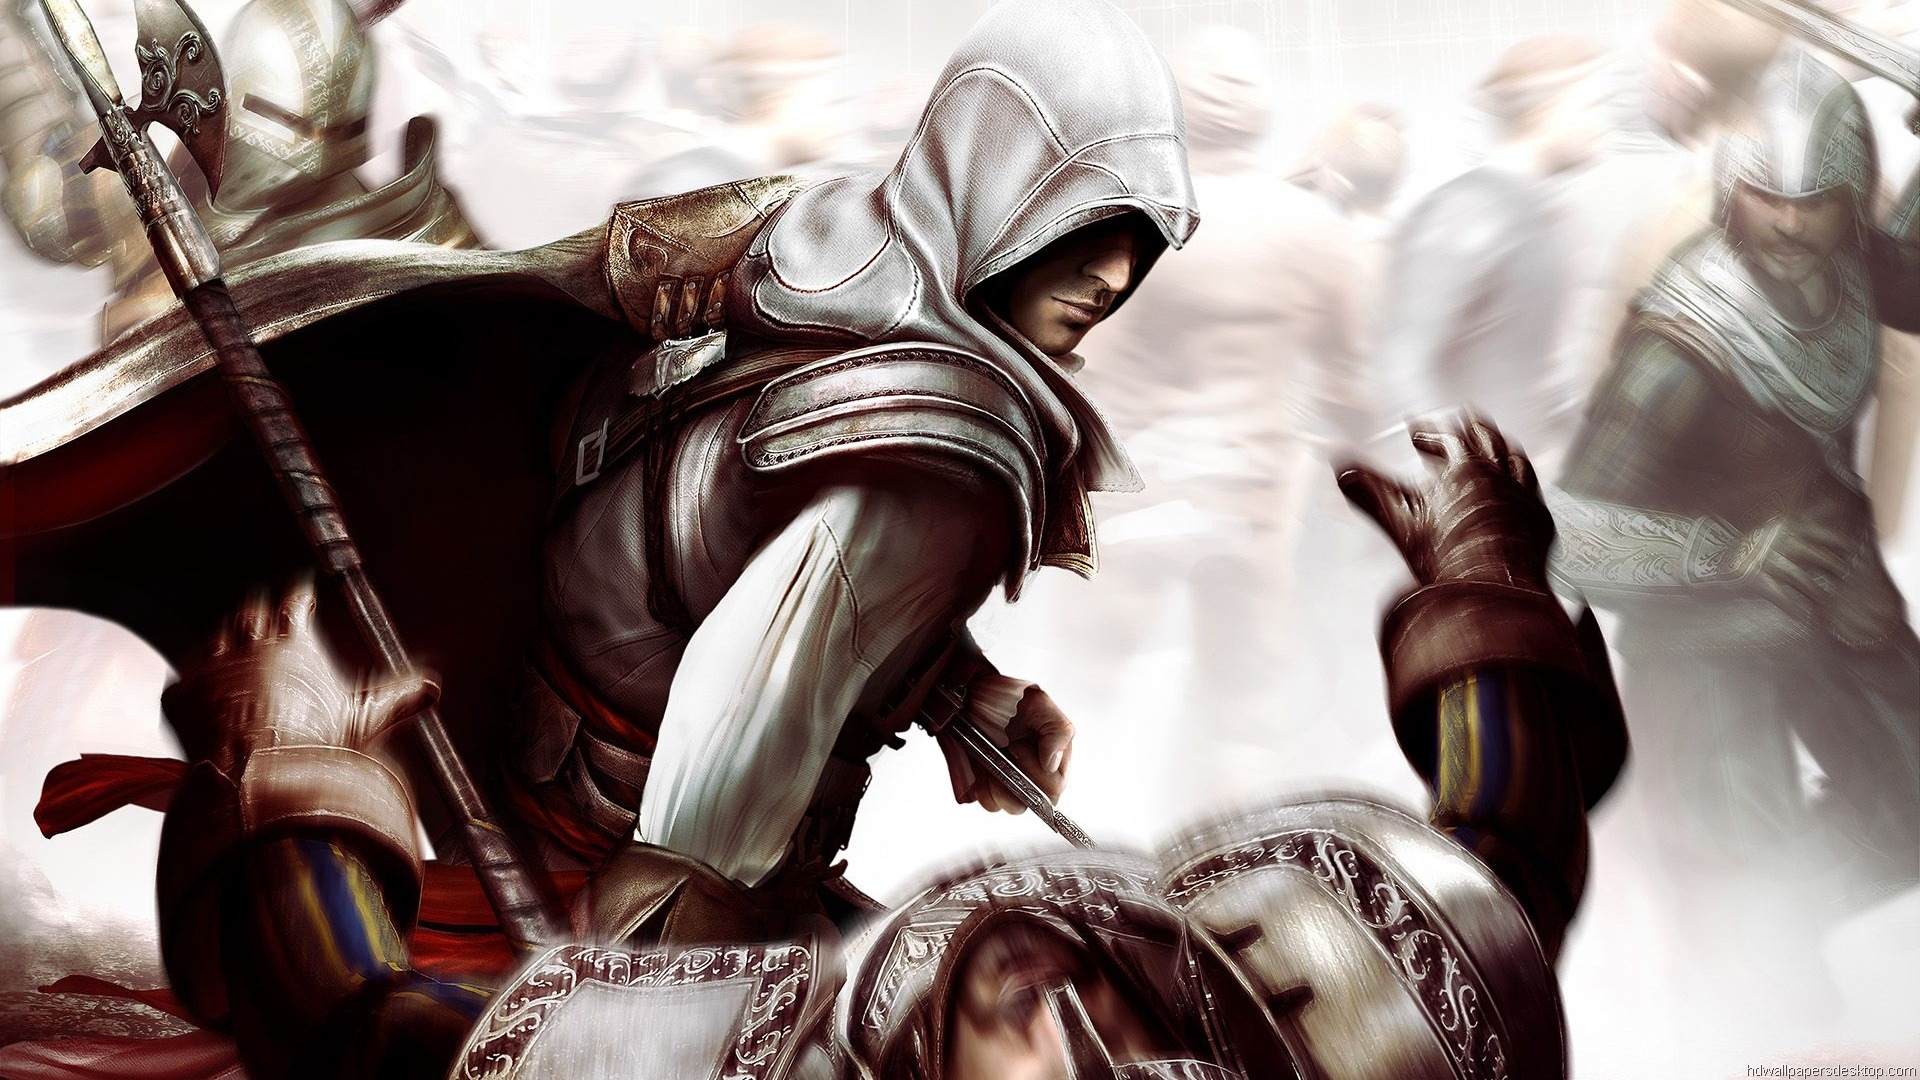 Assassins Creed Brotherhood Wallpaper: Assassin's Creed Brotherhood Wallpaper HD